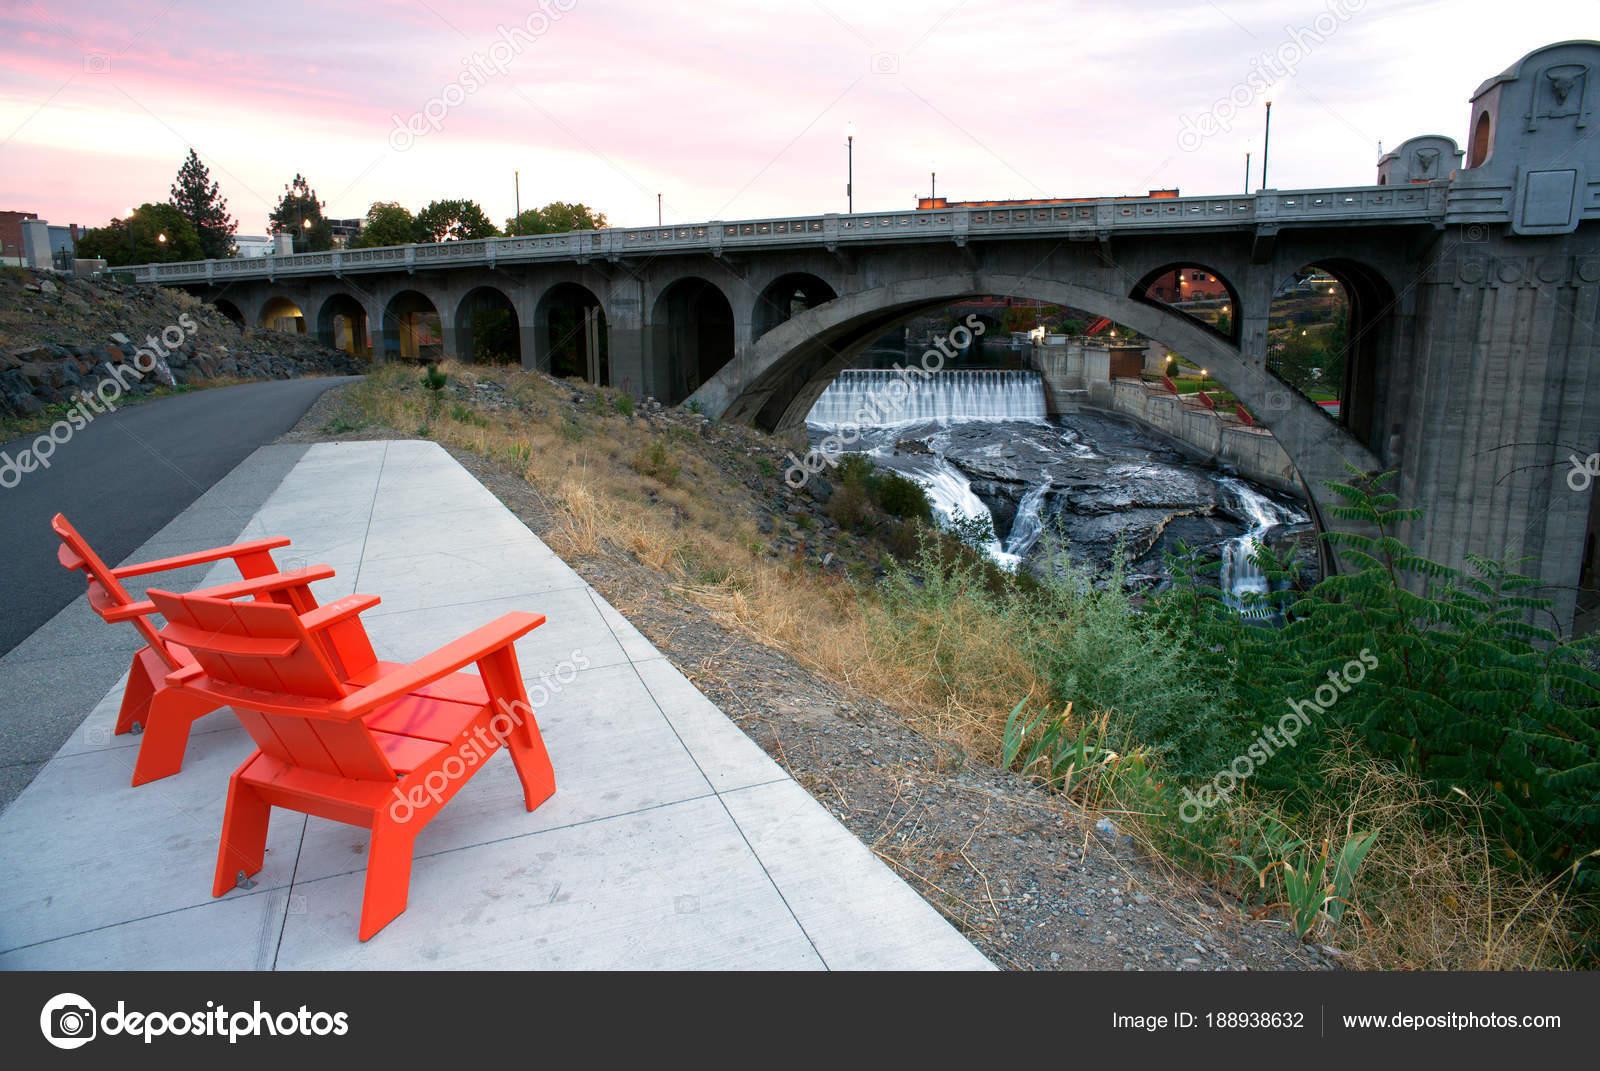 Sitting Area Chairs Riverfront View Arch Bridge Spokane Washington U2014 Stock  Photo